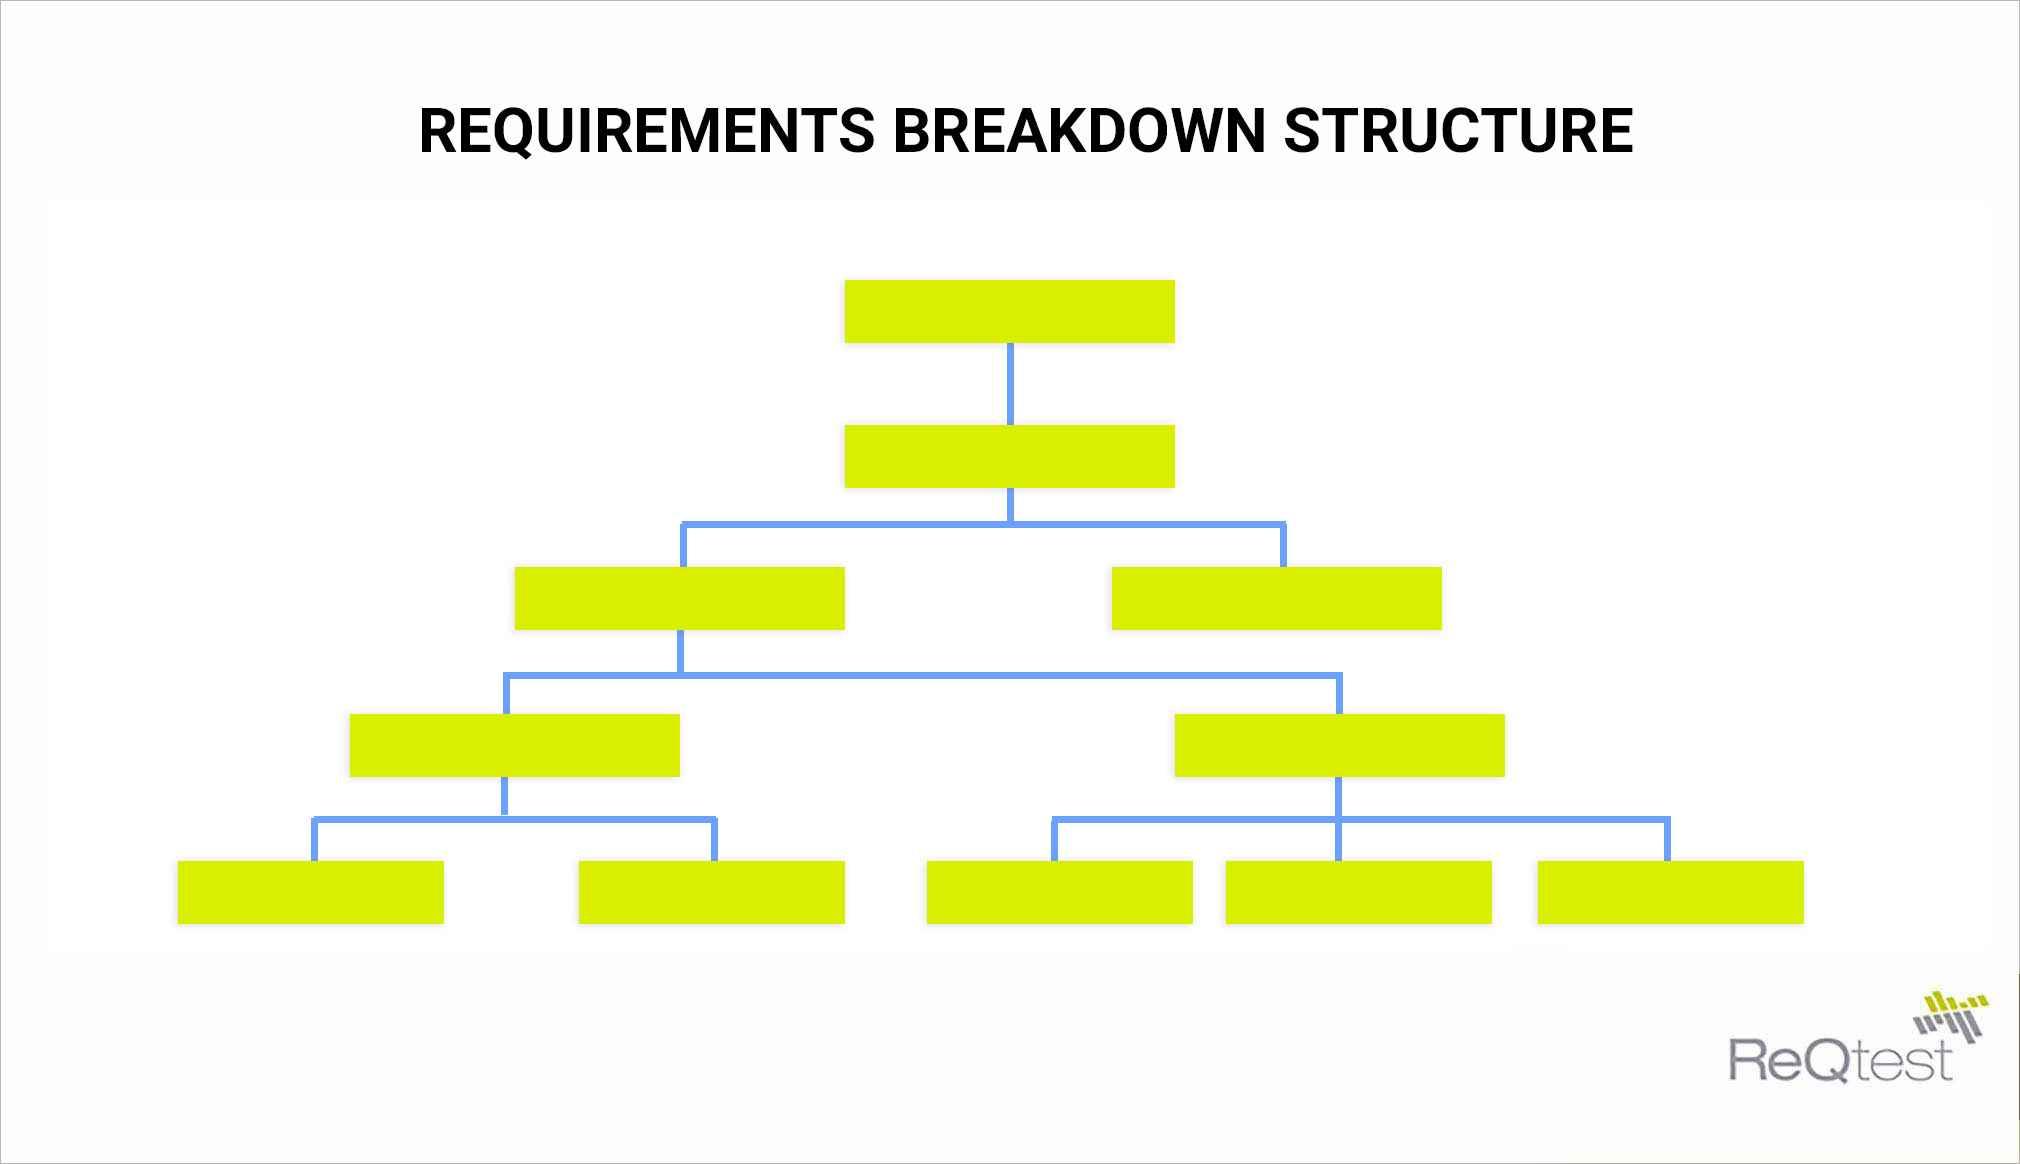 Requirements Breakdown Structure